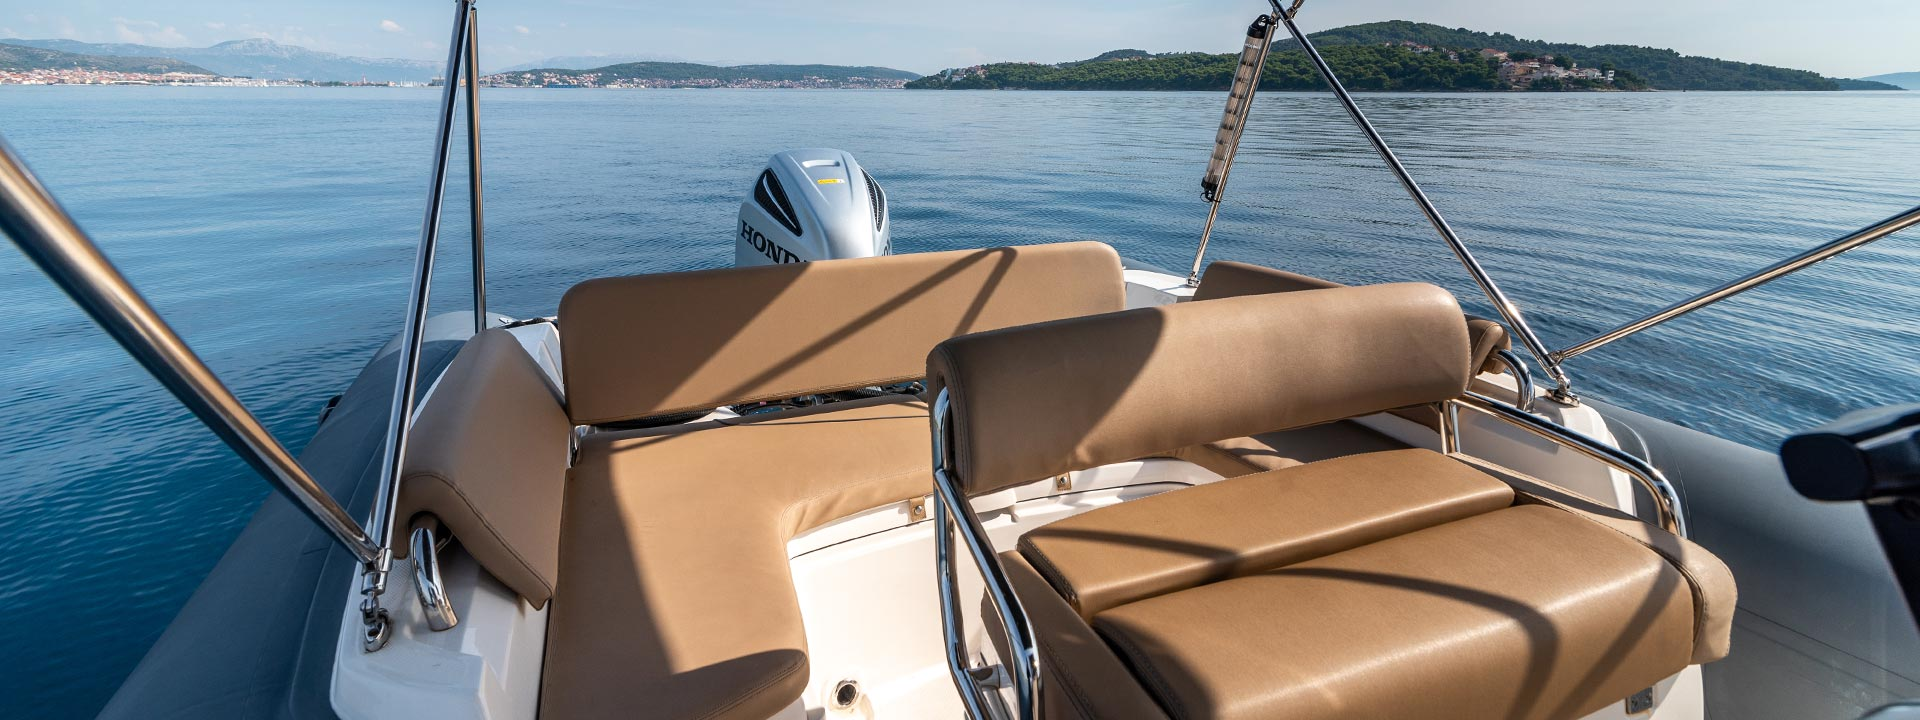 mayer-charter-boat-header-bwa-gto-sport-26-04